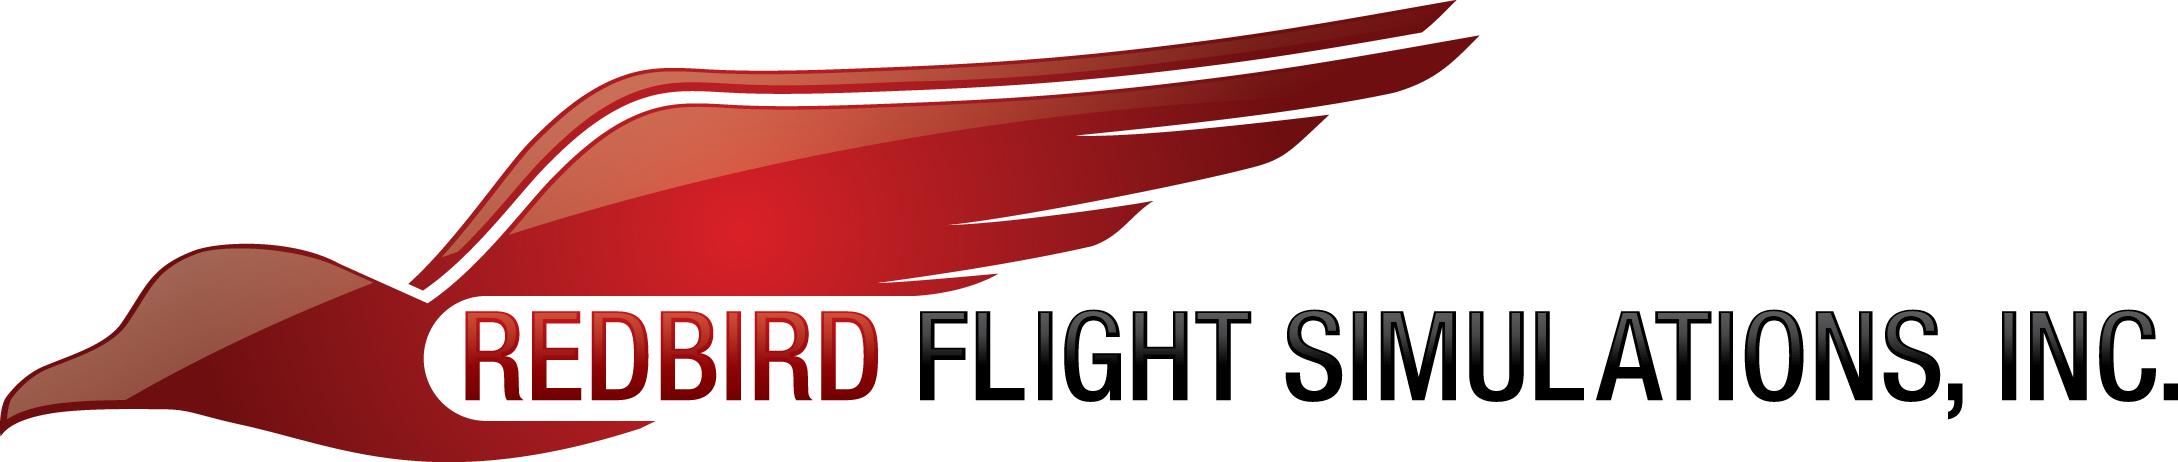 redbird-flight-simulations-logo-lg - Vertical Magazine